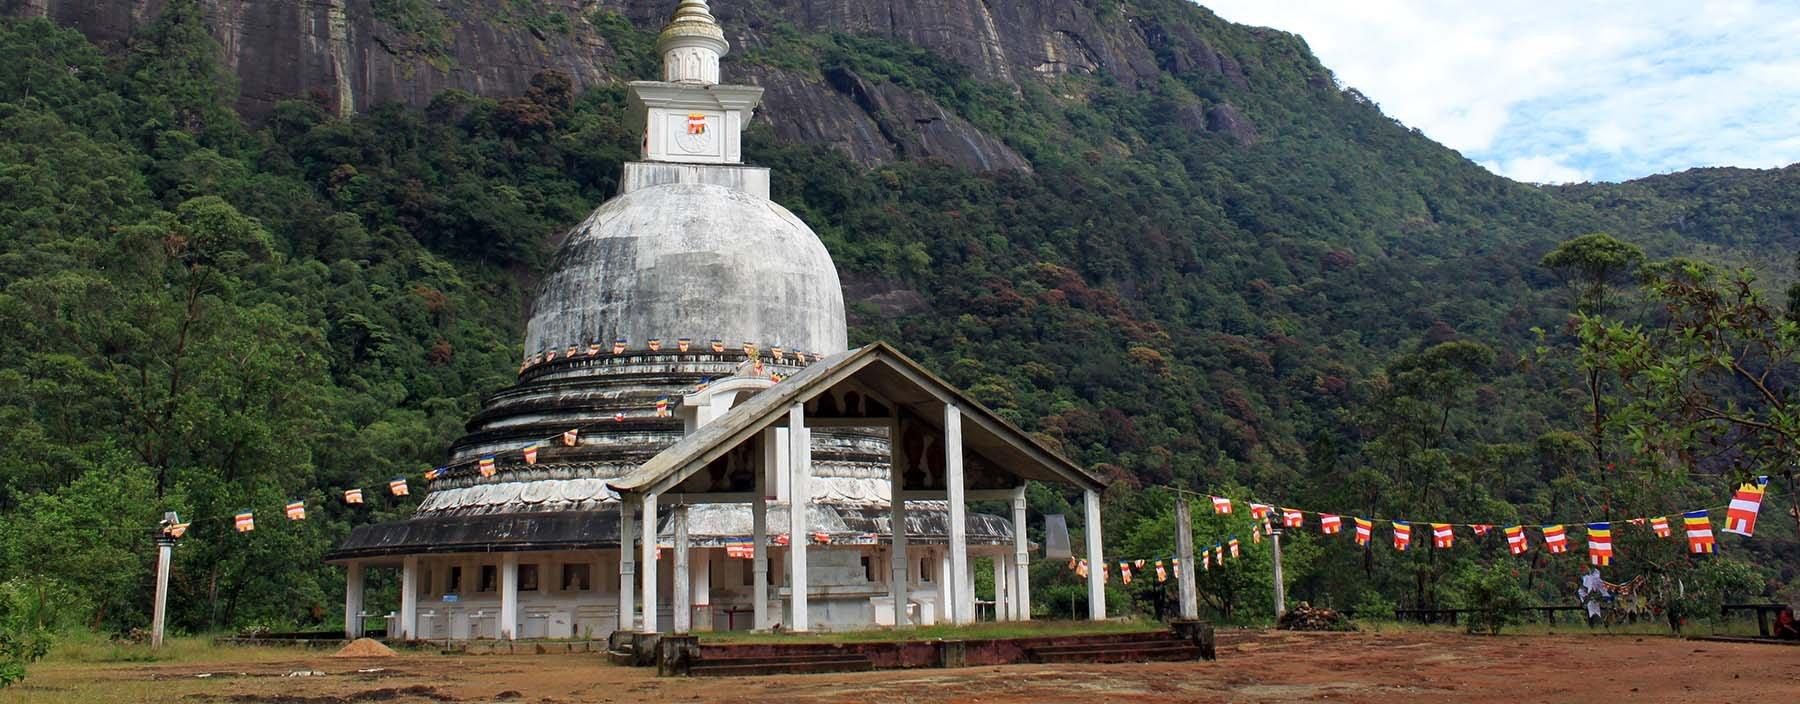 sri lanka, adam's peak, stupa.jpg